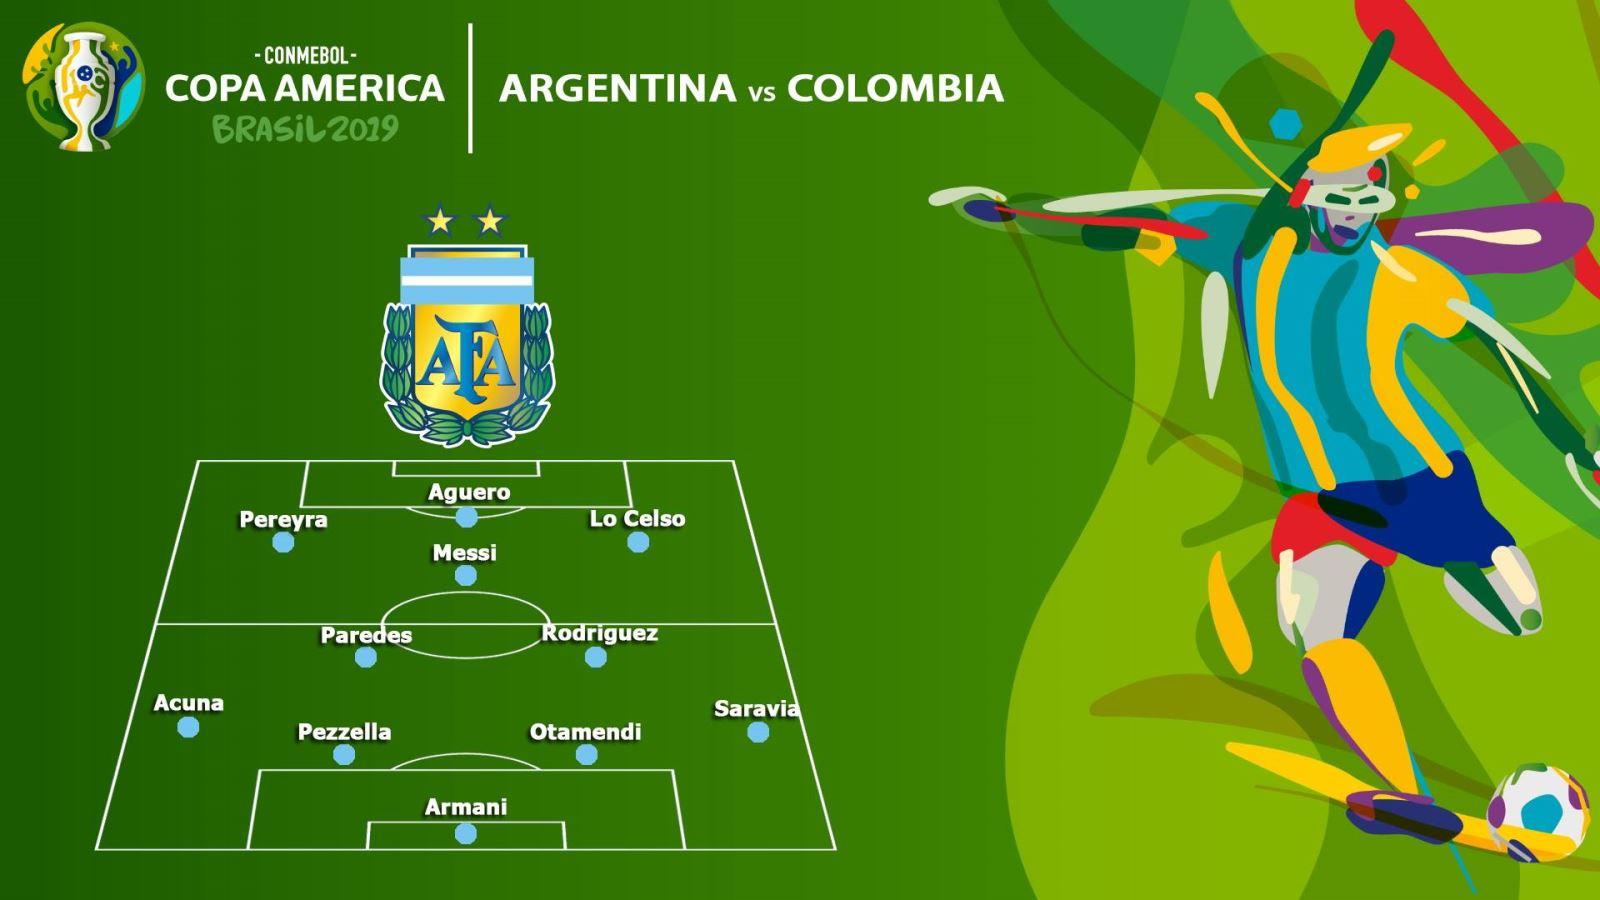 trực tiếp bóng đá, Argentina vs Colombia, soi kèo Argentina vs Colombia, kèo bóng đá, xem bóng đá, truc tiep bong da, trực tiếp Argentina, Argentina, Copa America 2019